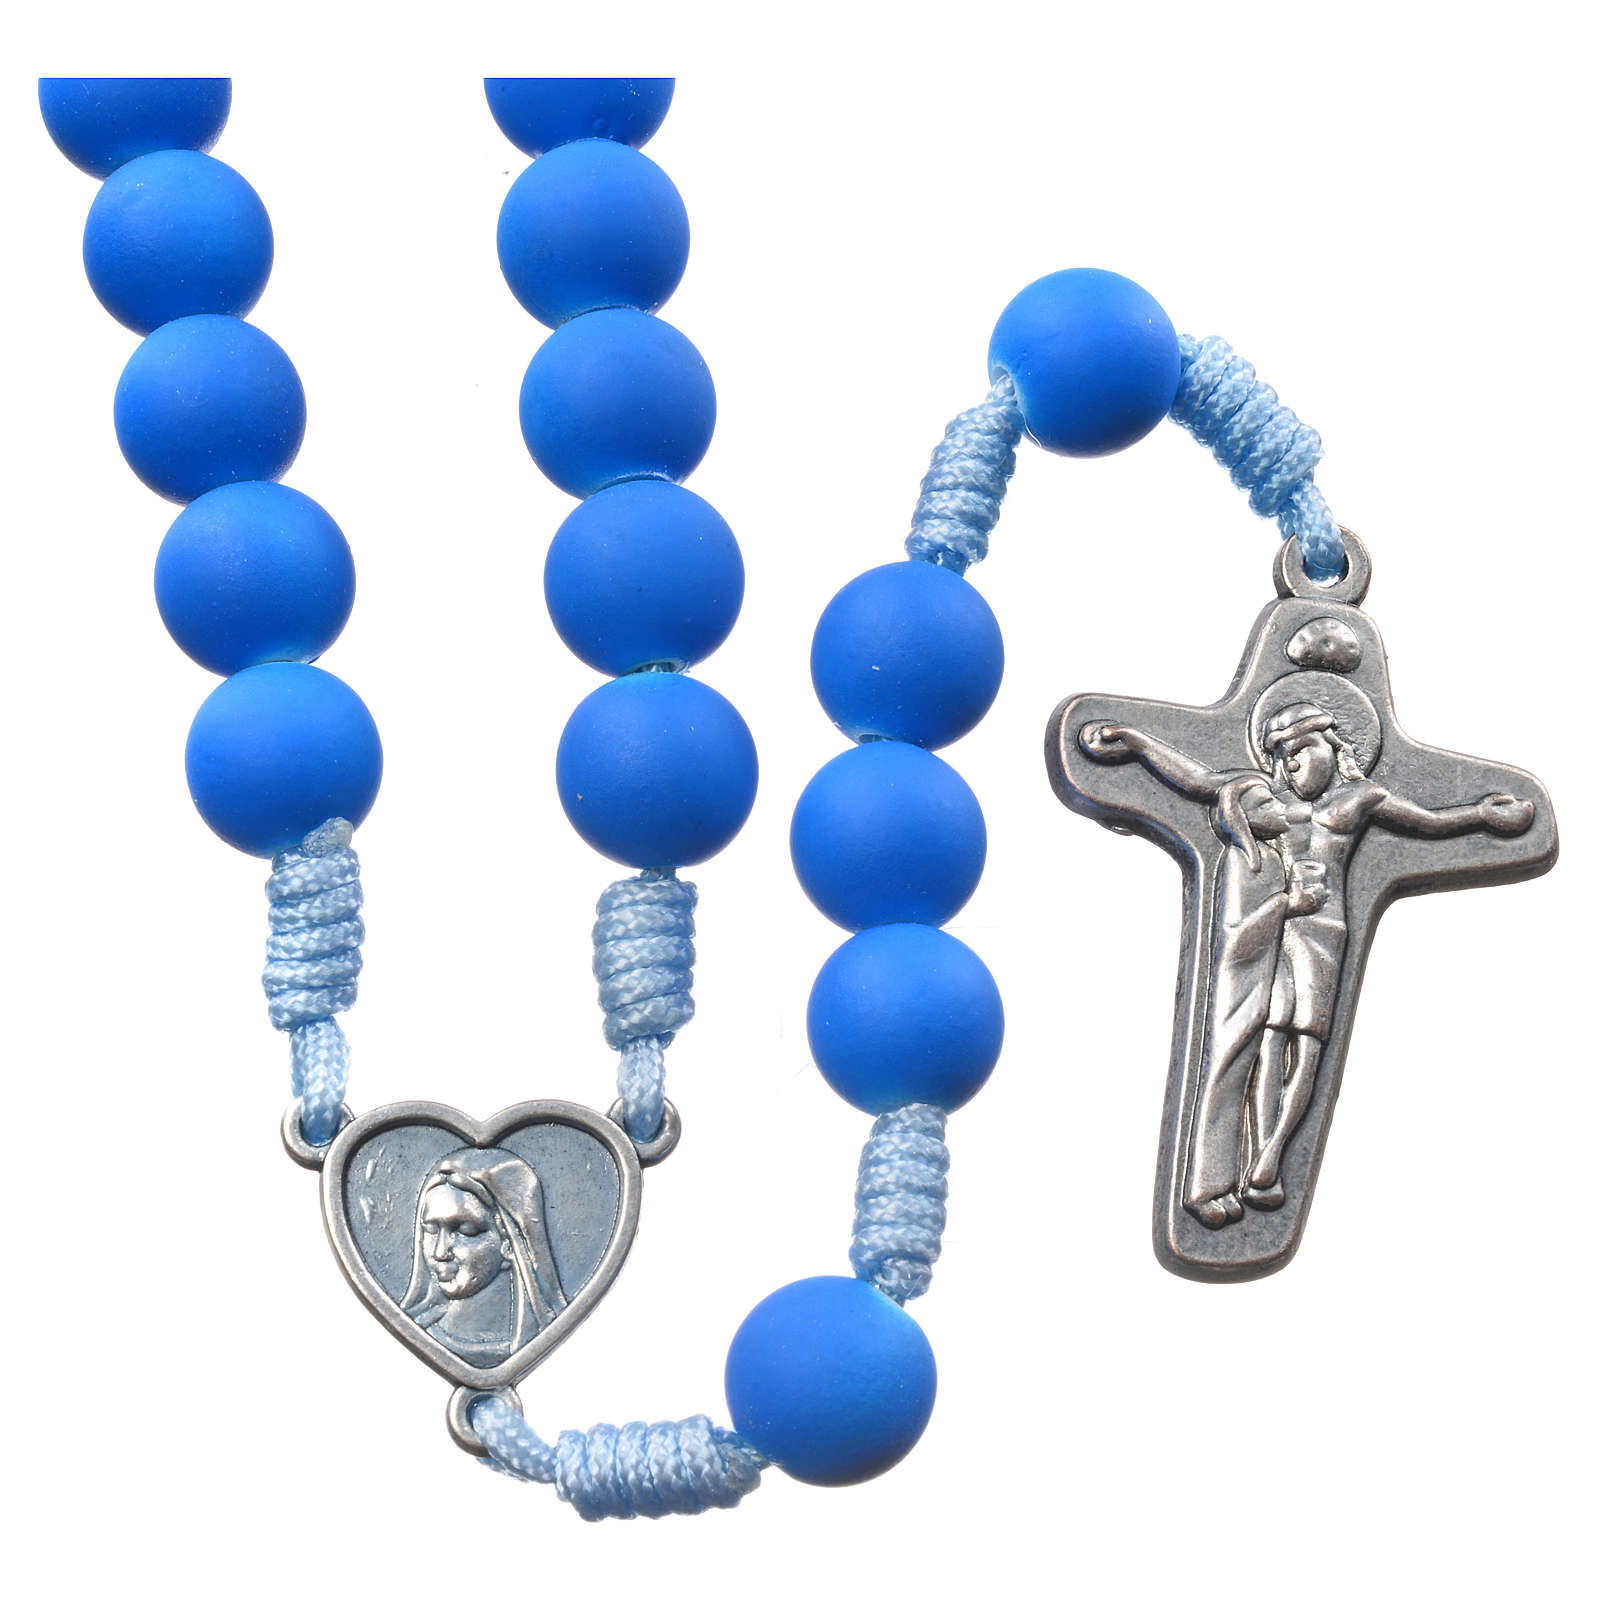 Medjugorje rosary in blue fimo with Medjugorje soil 4